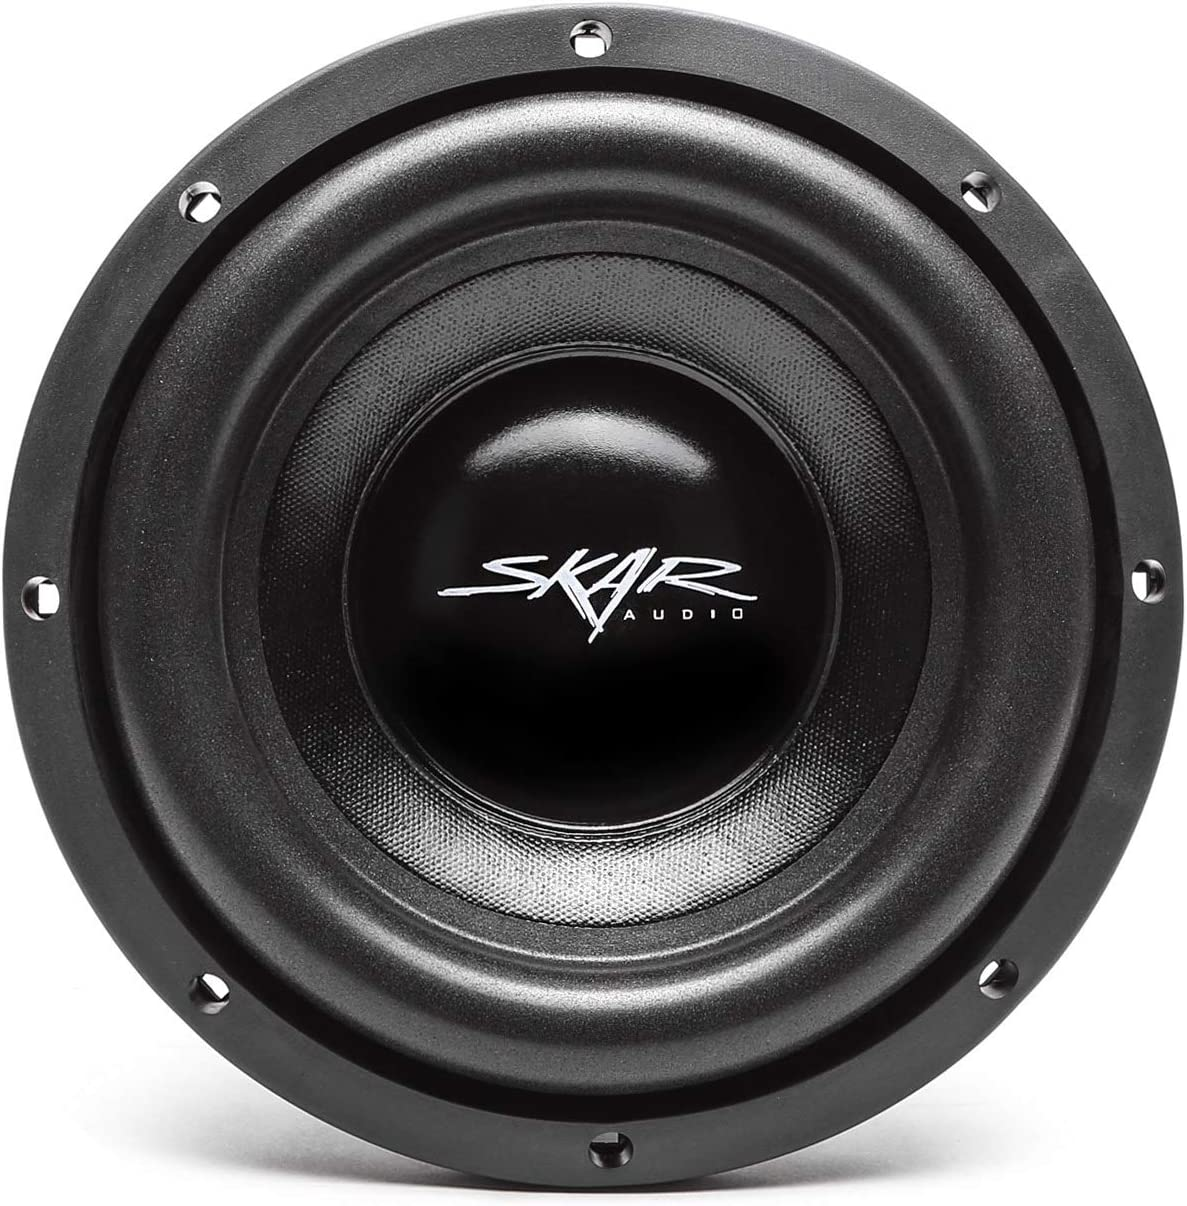 Skar Audio best free air subwoofer